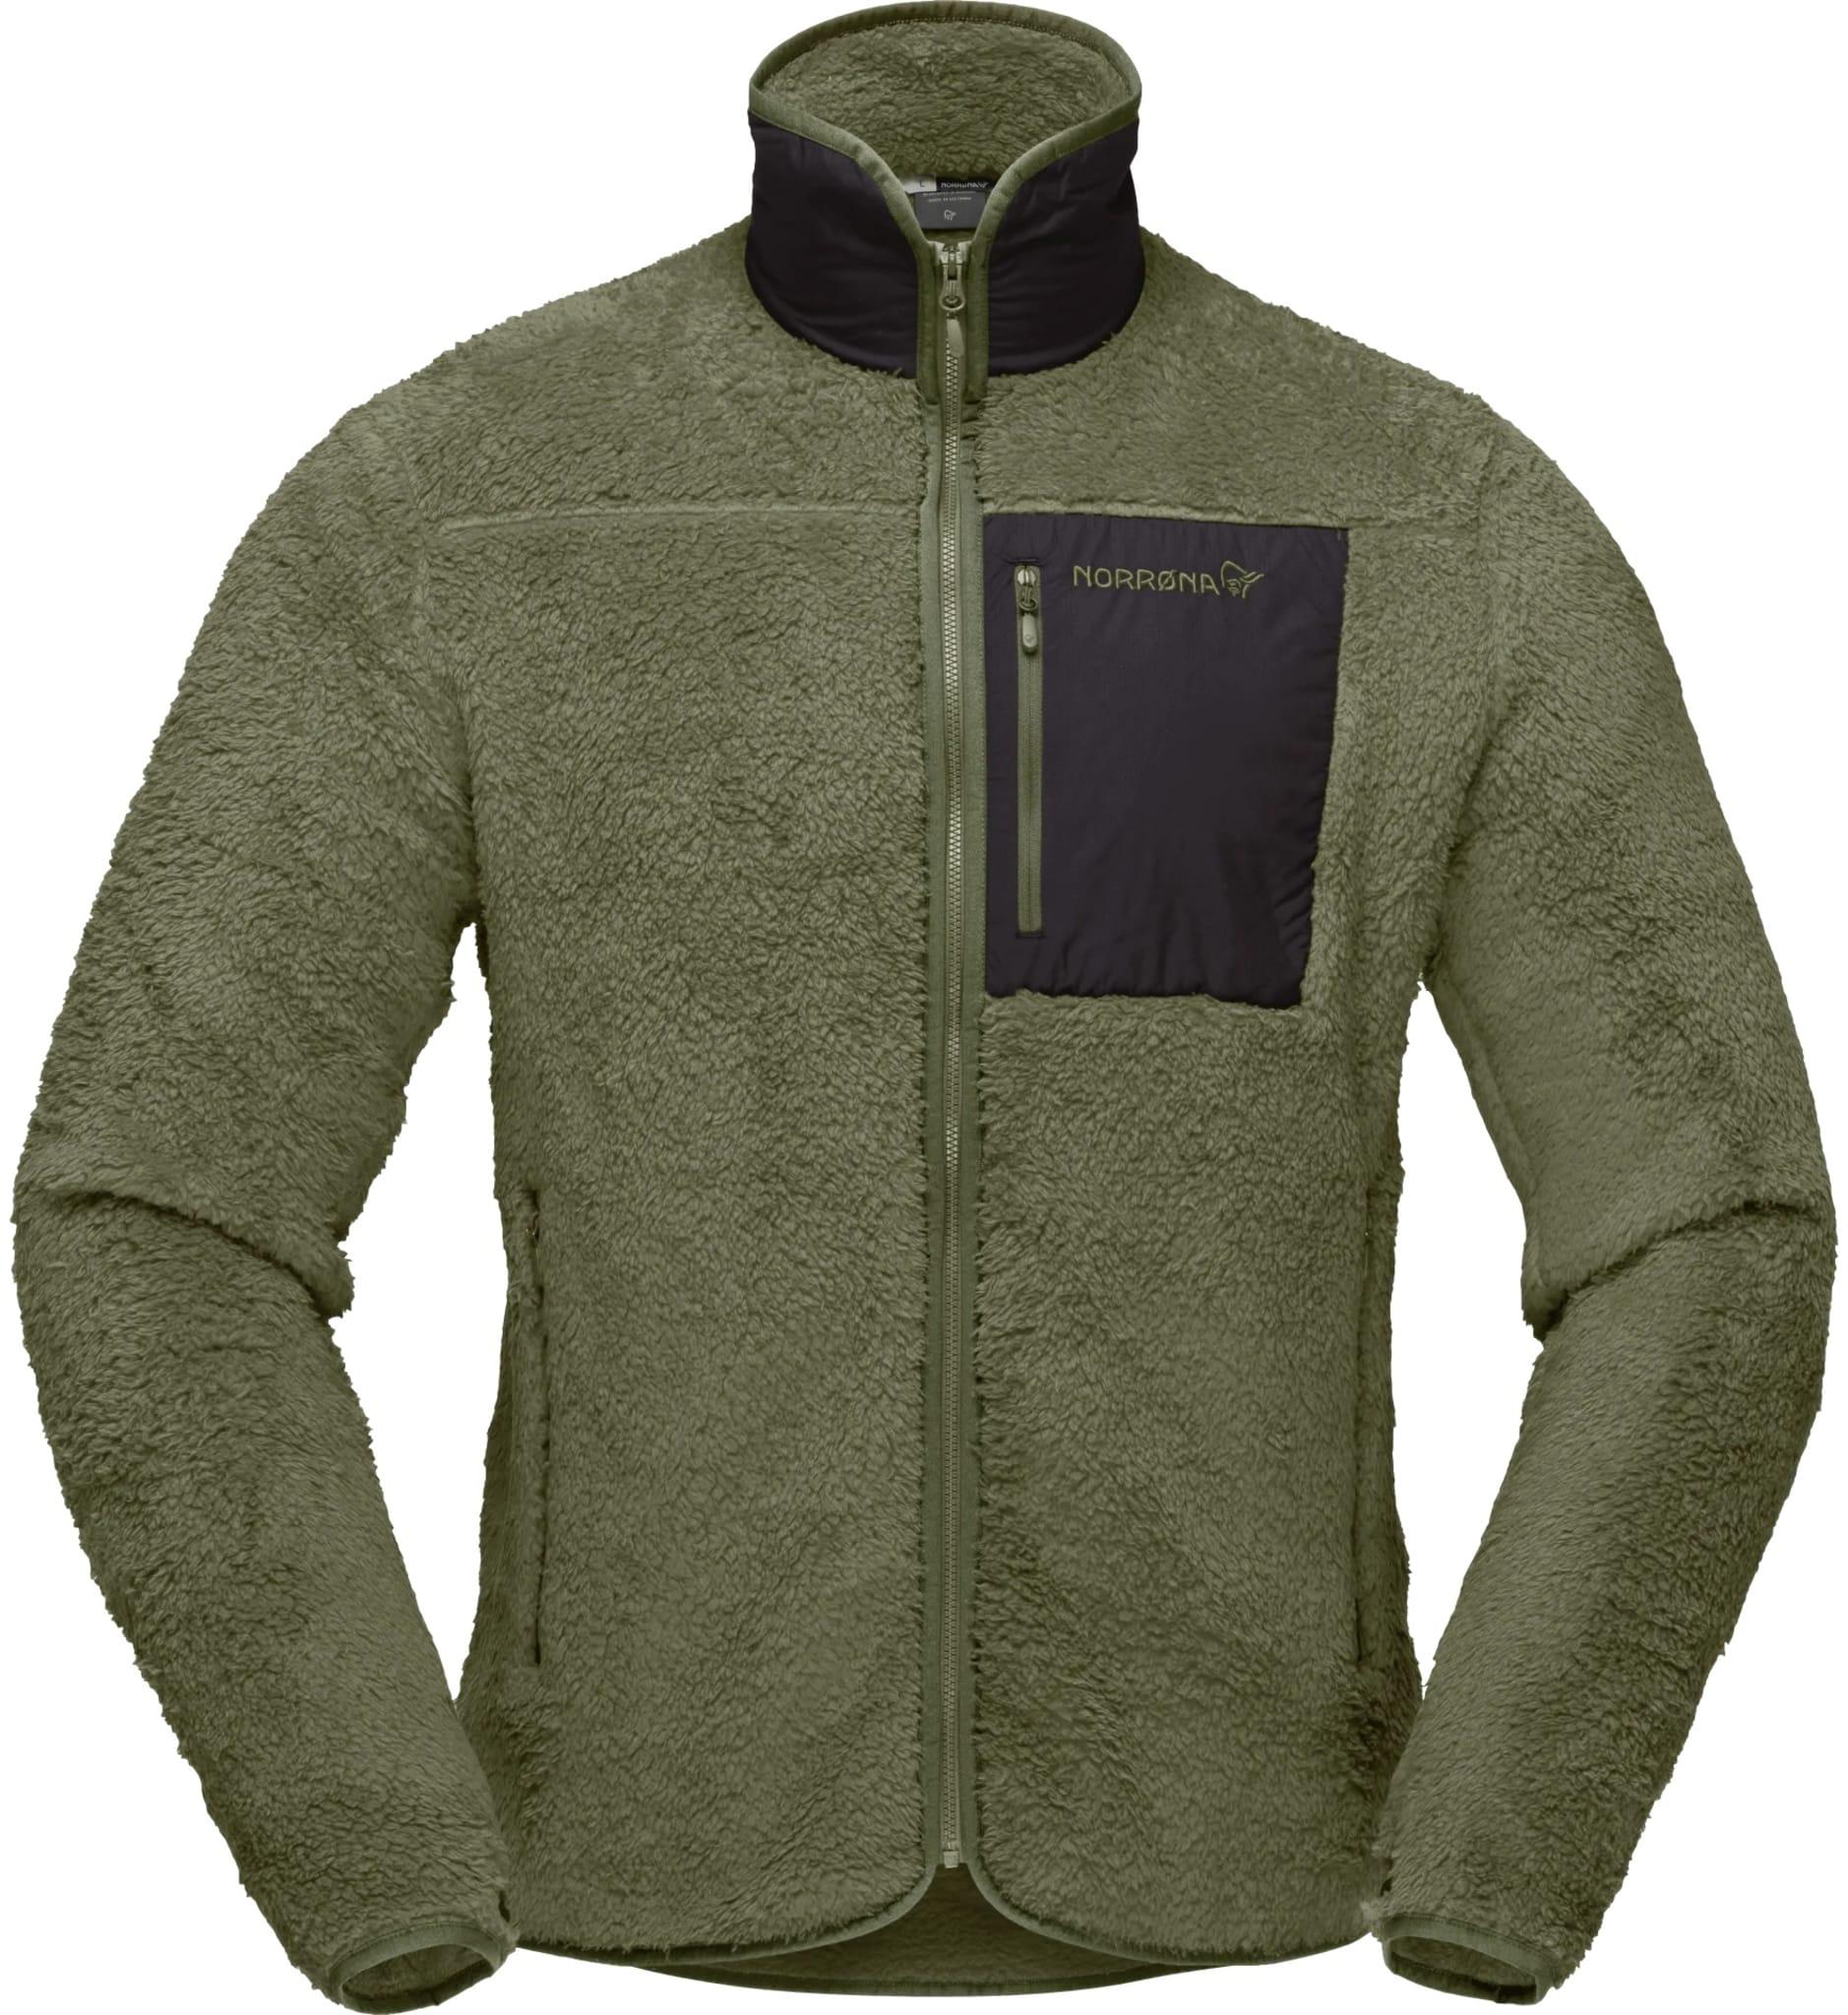 Warm3 Jacket M